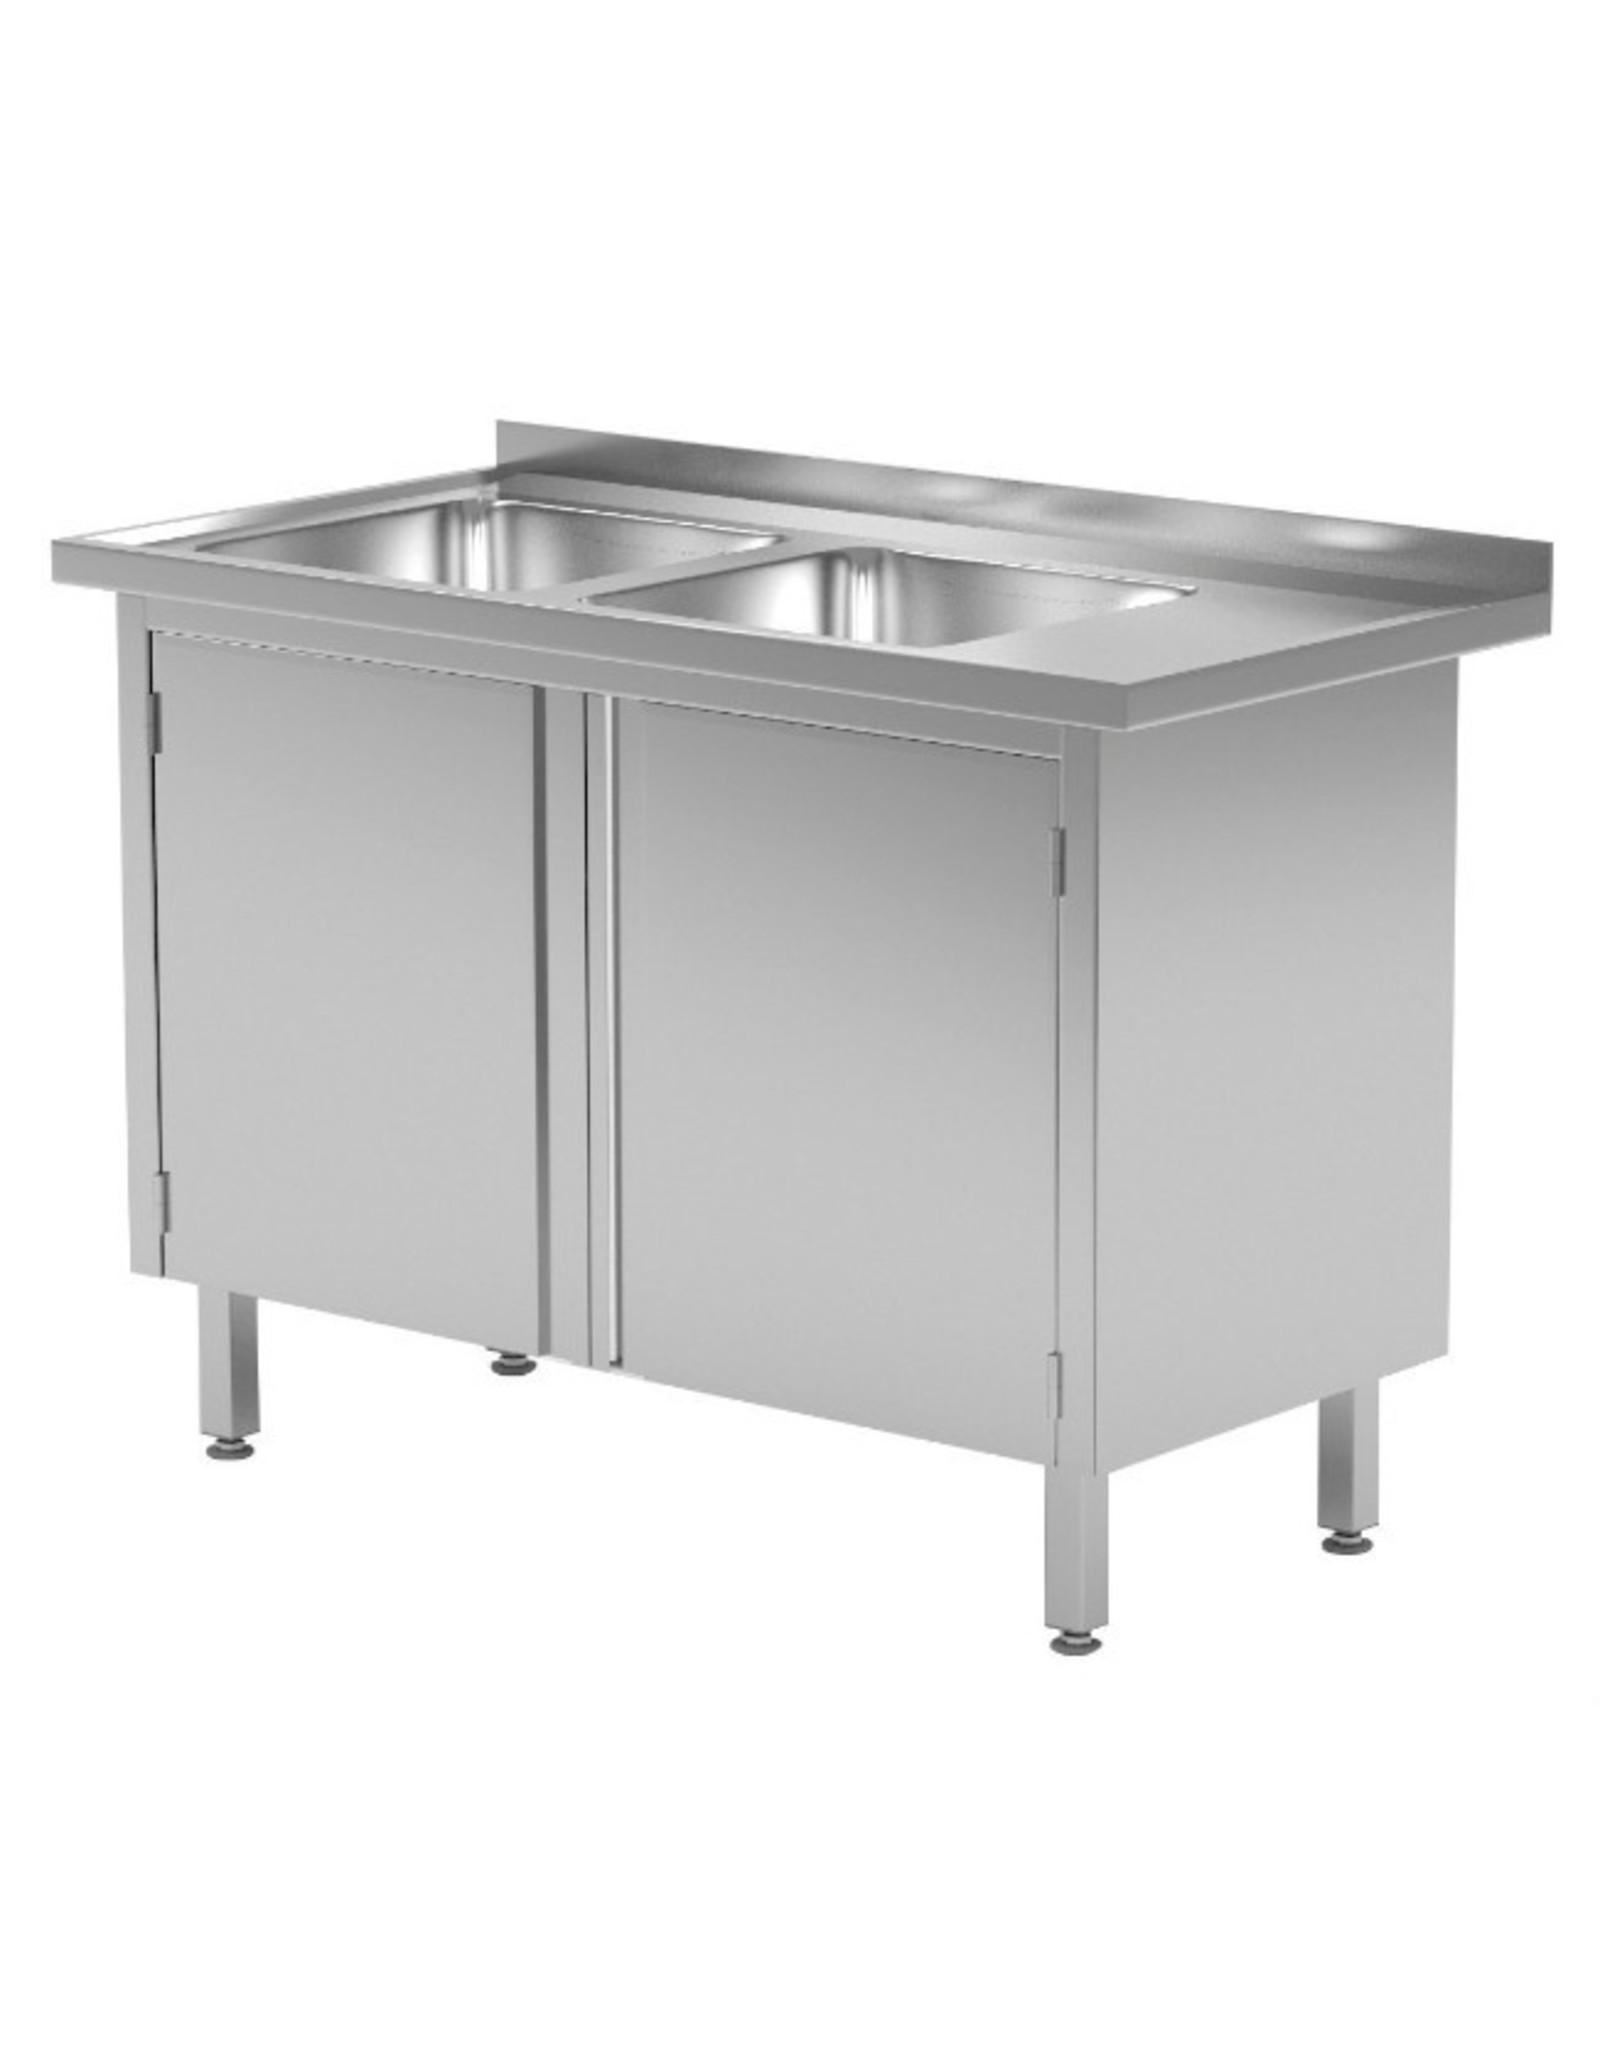 Spoeltafel met kast met klapdeuren | 2 spoelbakken links | 1100-1500mm breed | 600 of 700mm diep